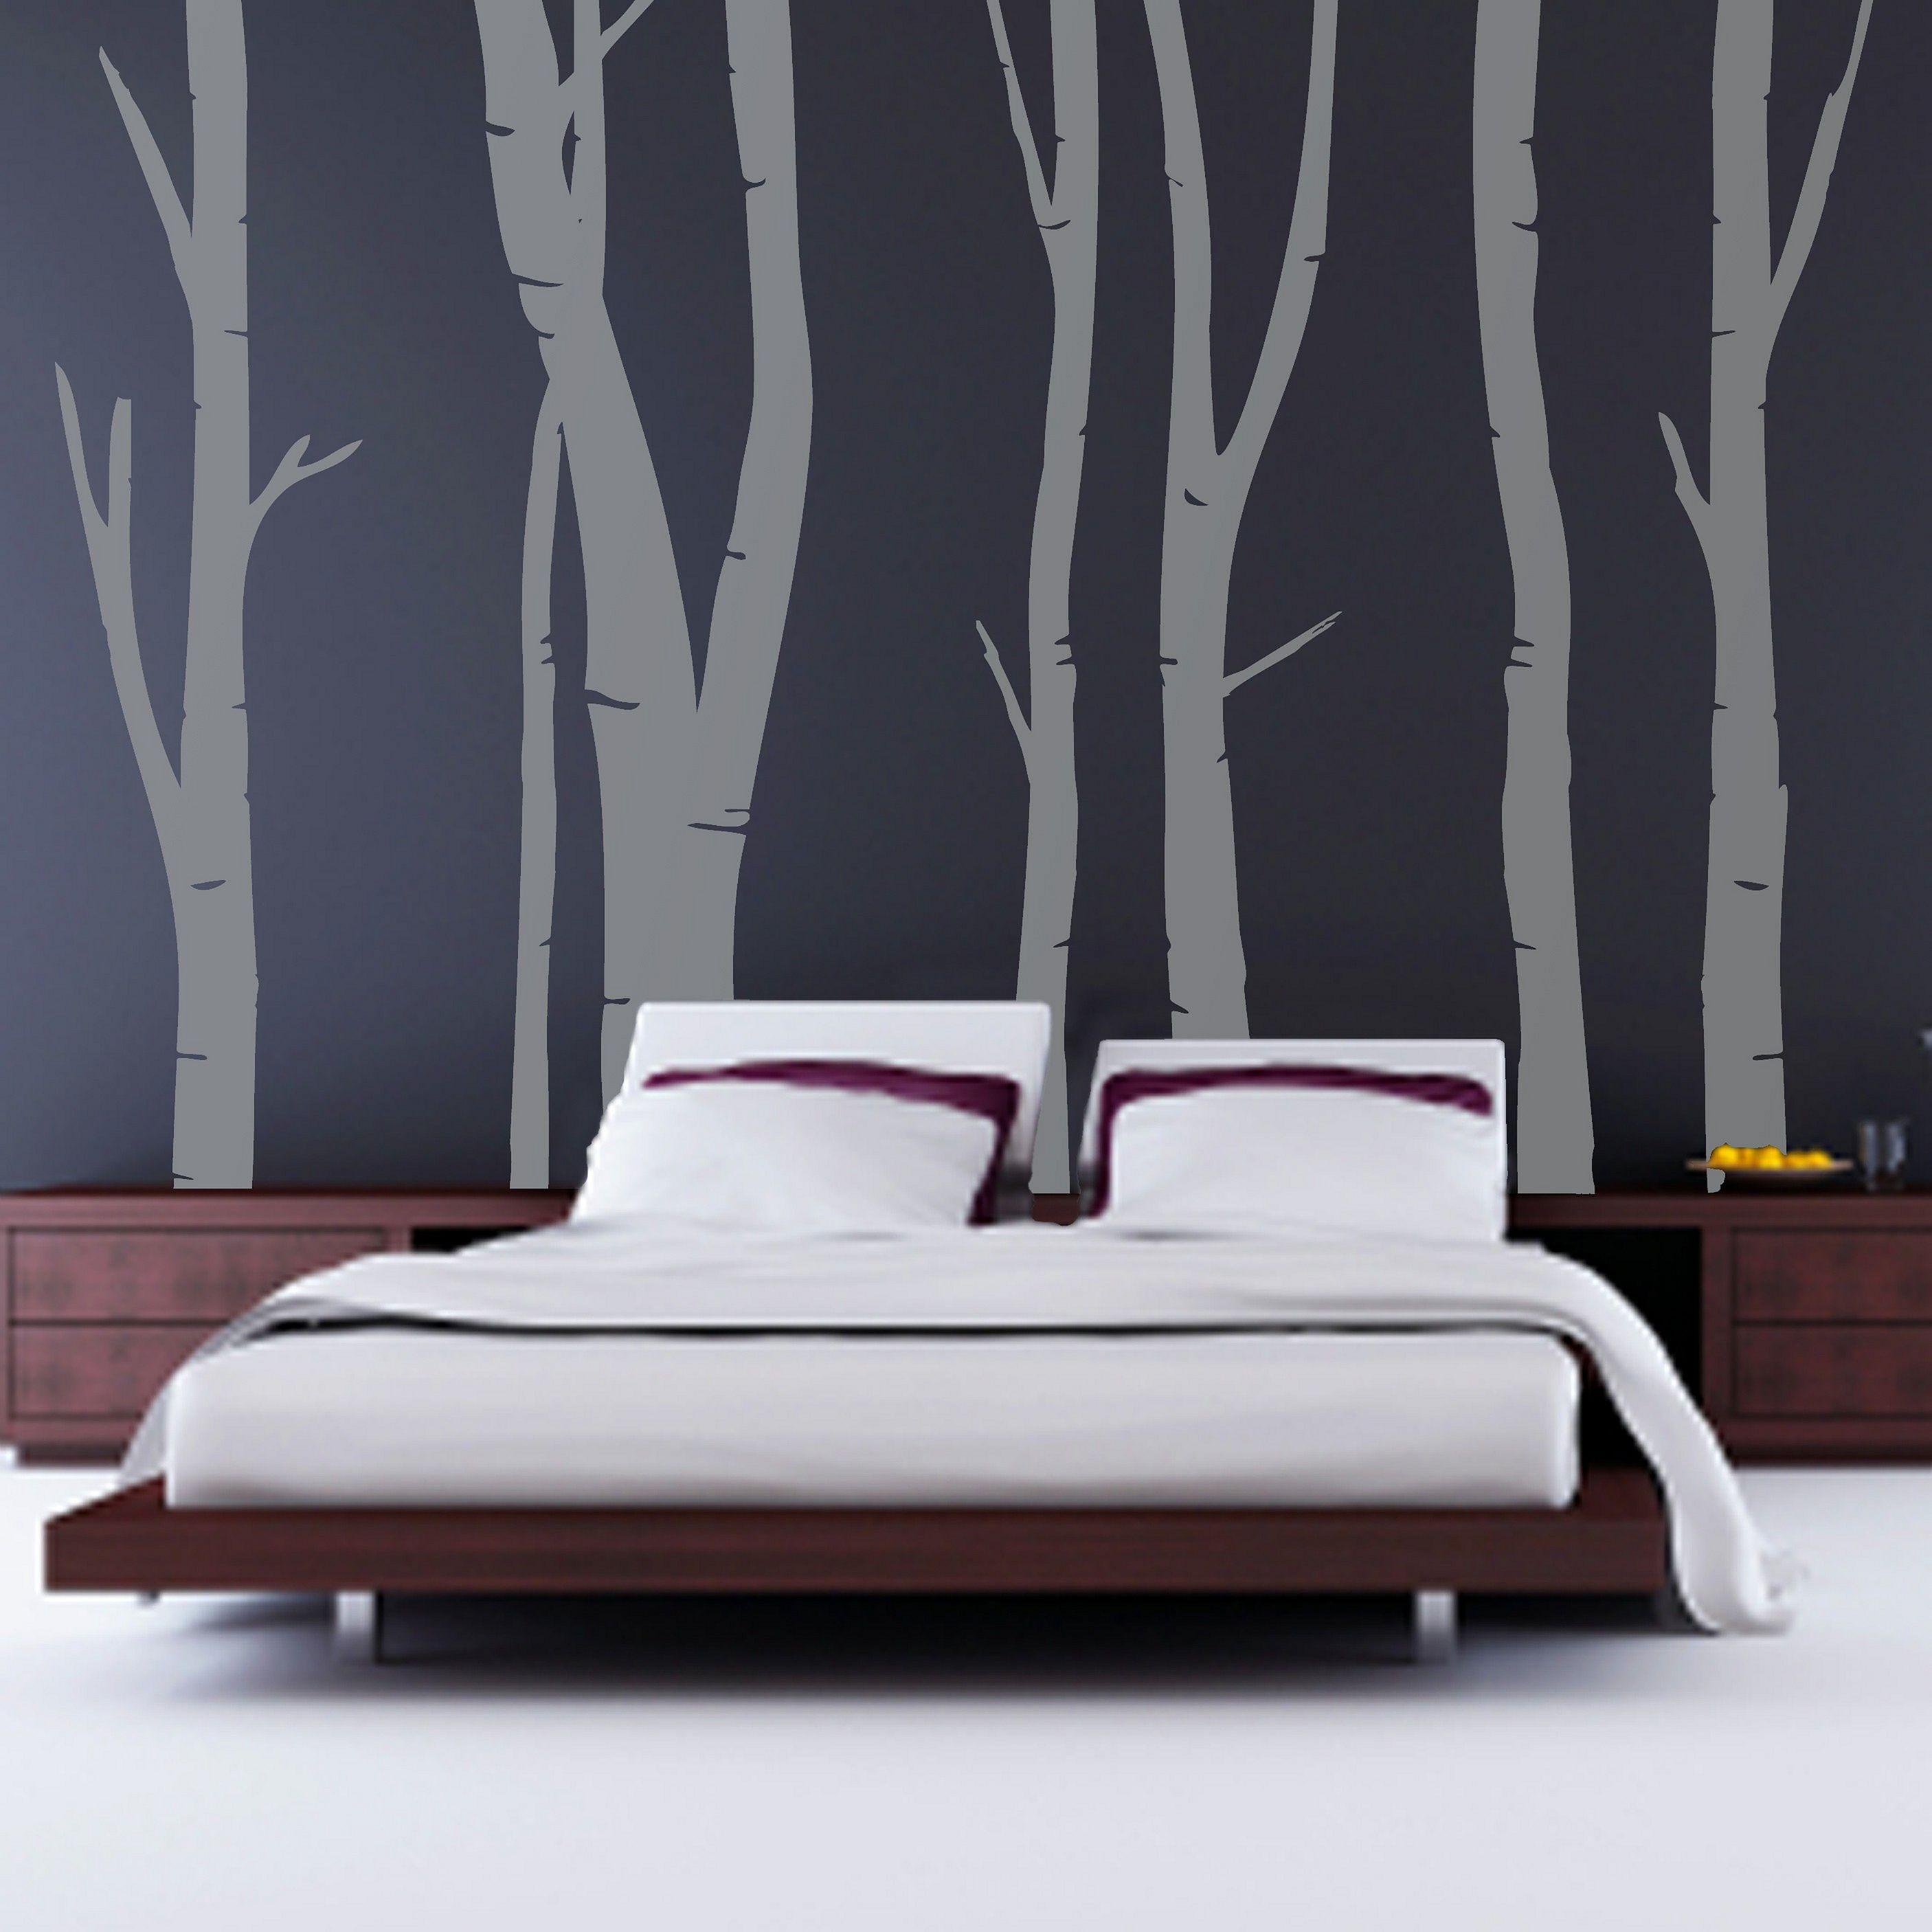 Cool Bedroom Wall Designs - HD Wallpaper